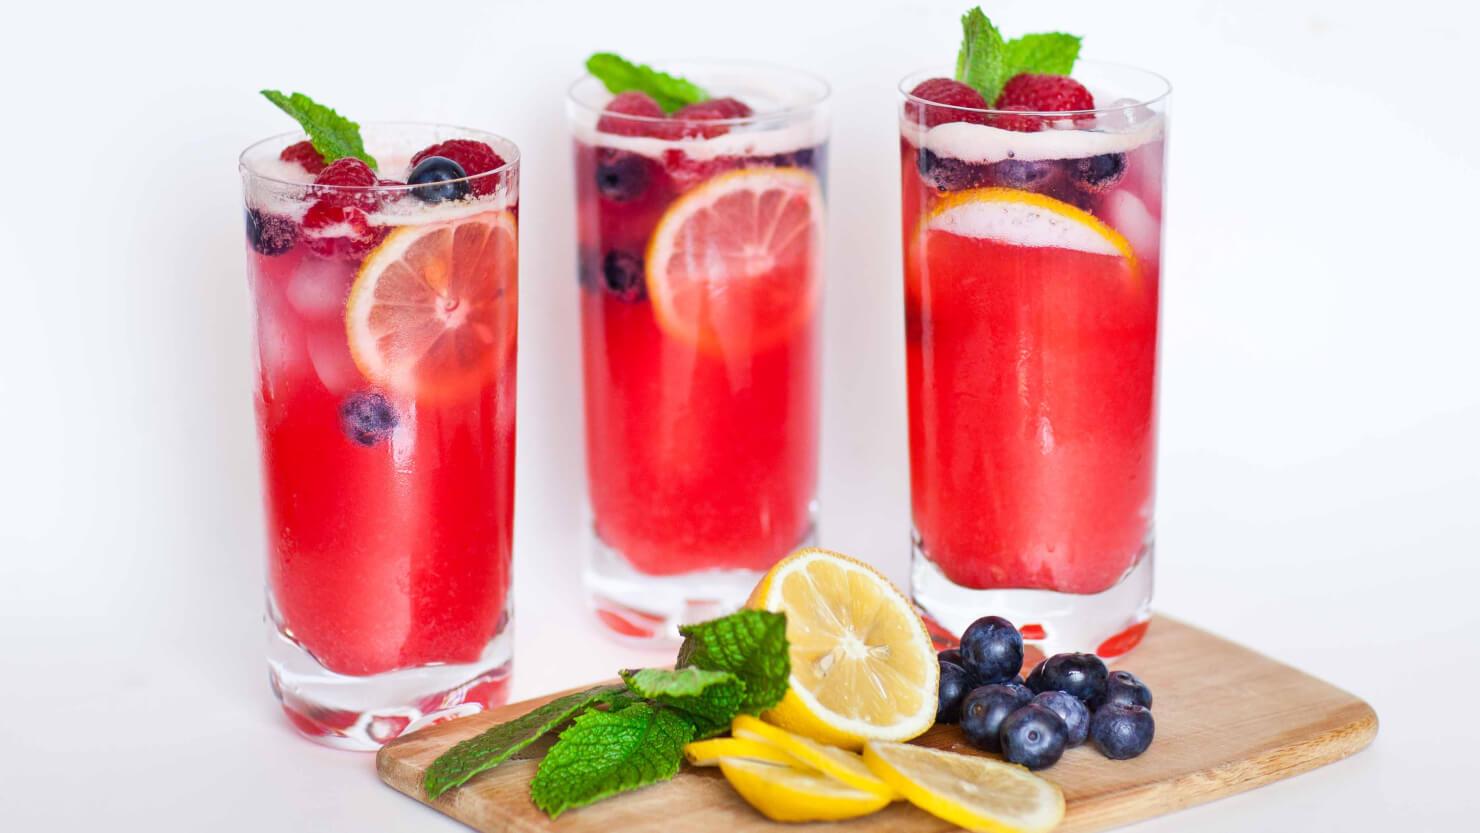 how to make lemonade with real lemons and splenda